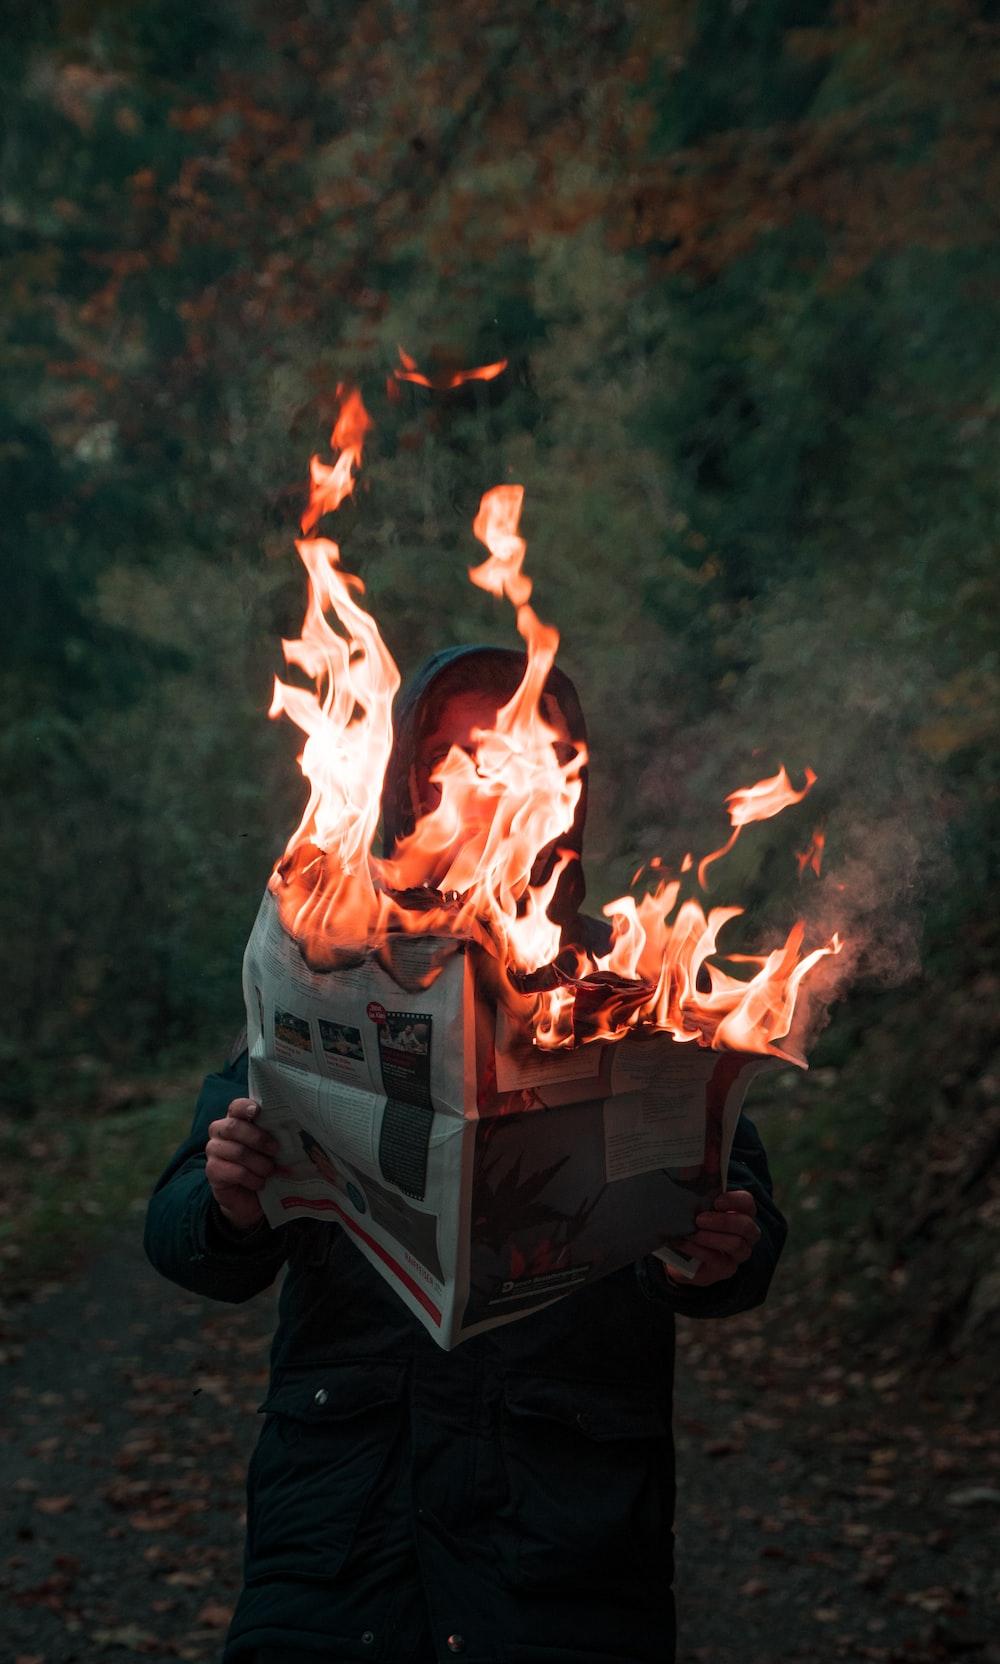 burning fire in gray box